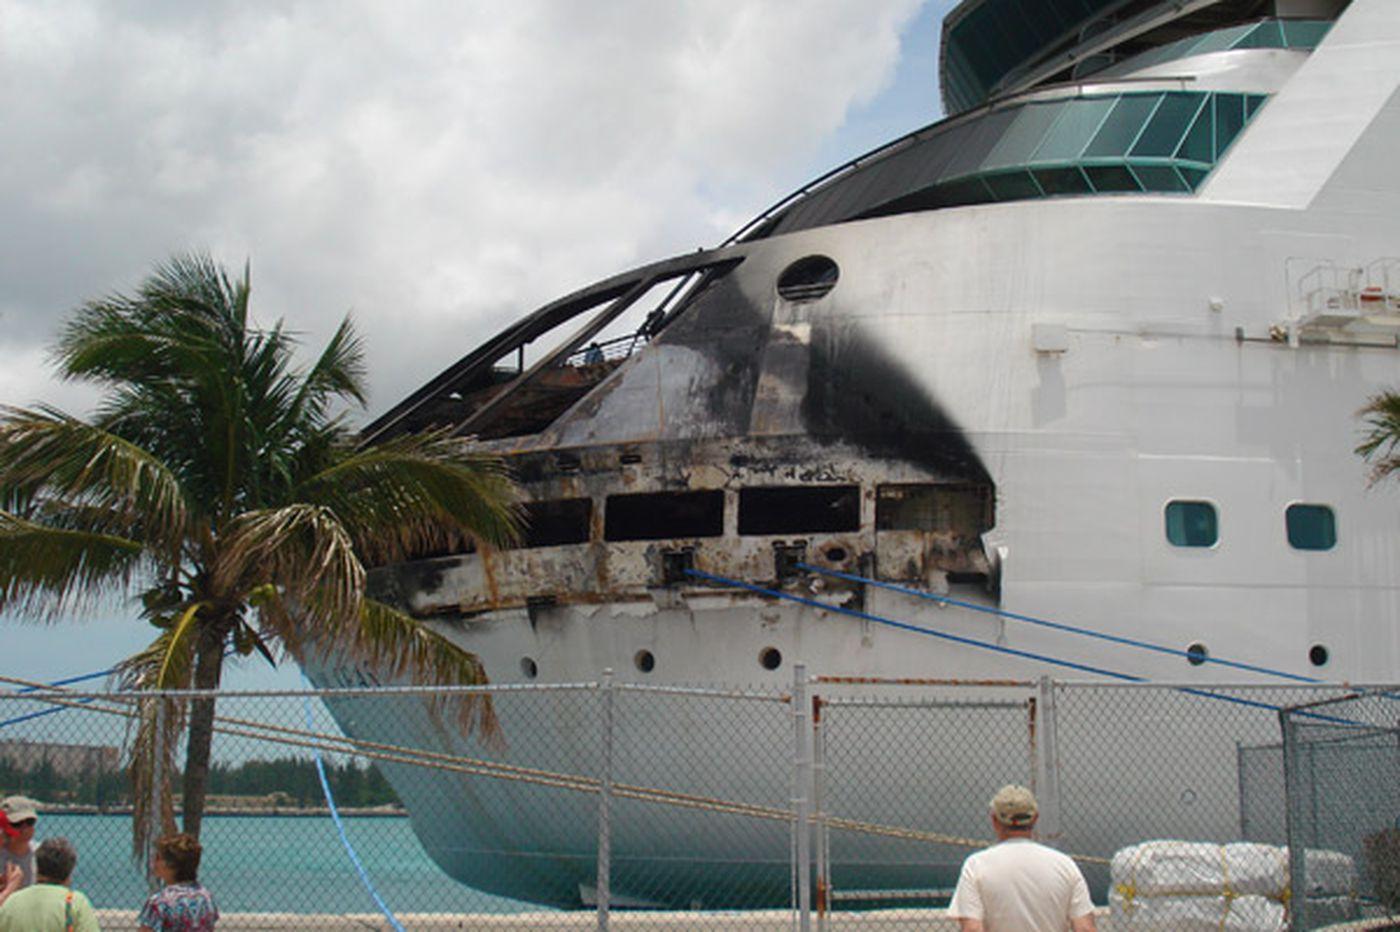 N.J. couple tells of tense time aboard burning cruise ship